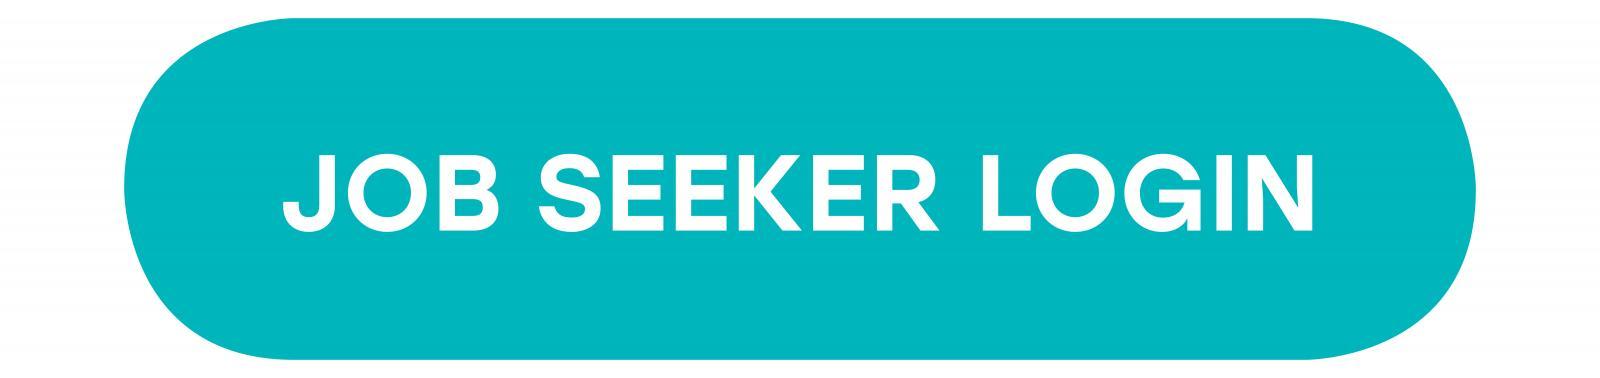 Job Seeker Portal | Help Employment & Training